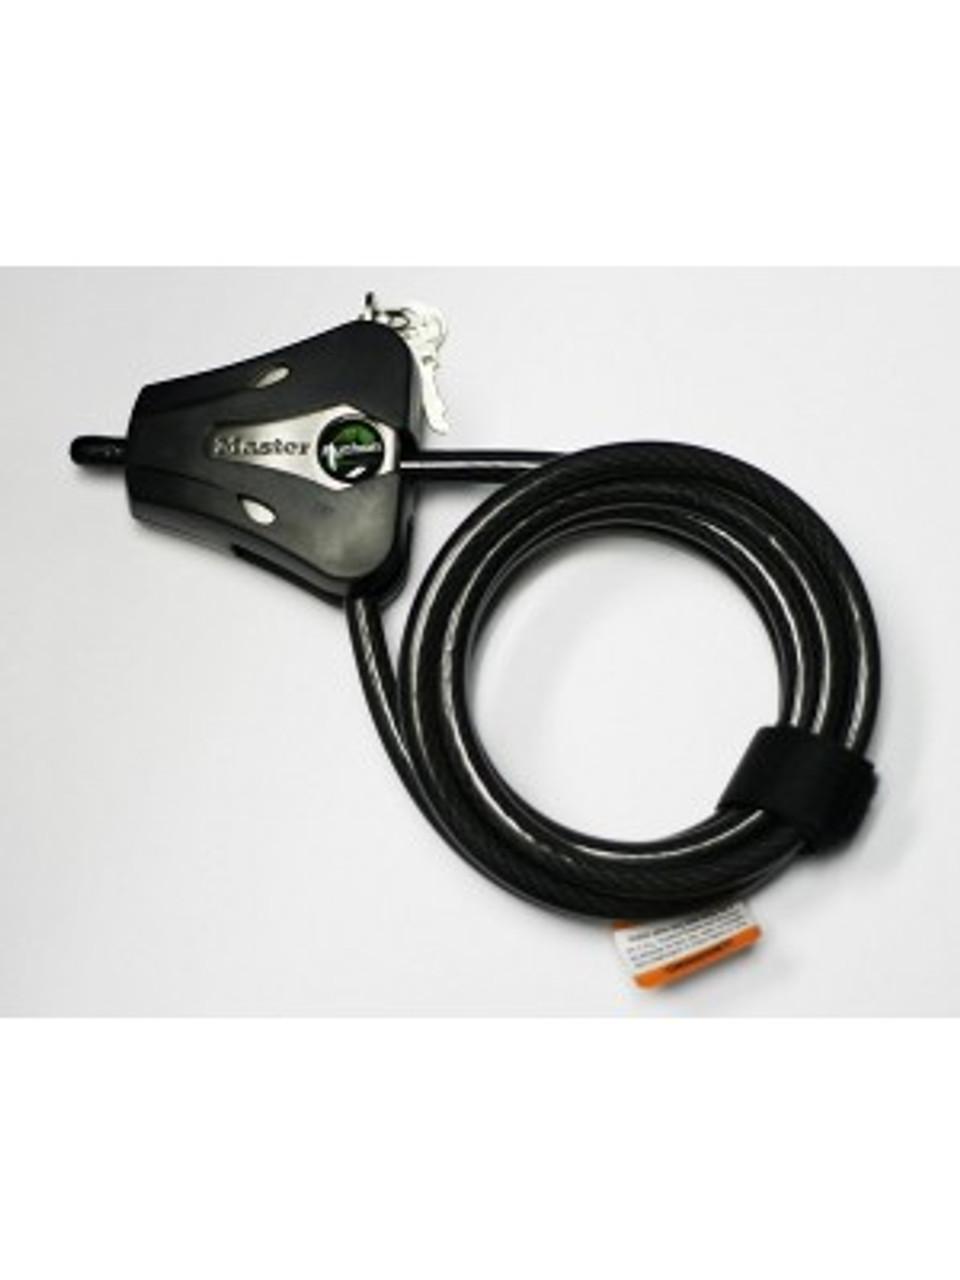 "5/16"" Python Cable Lock"